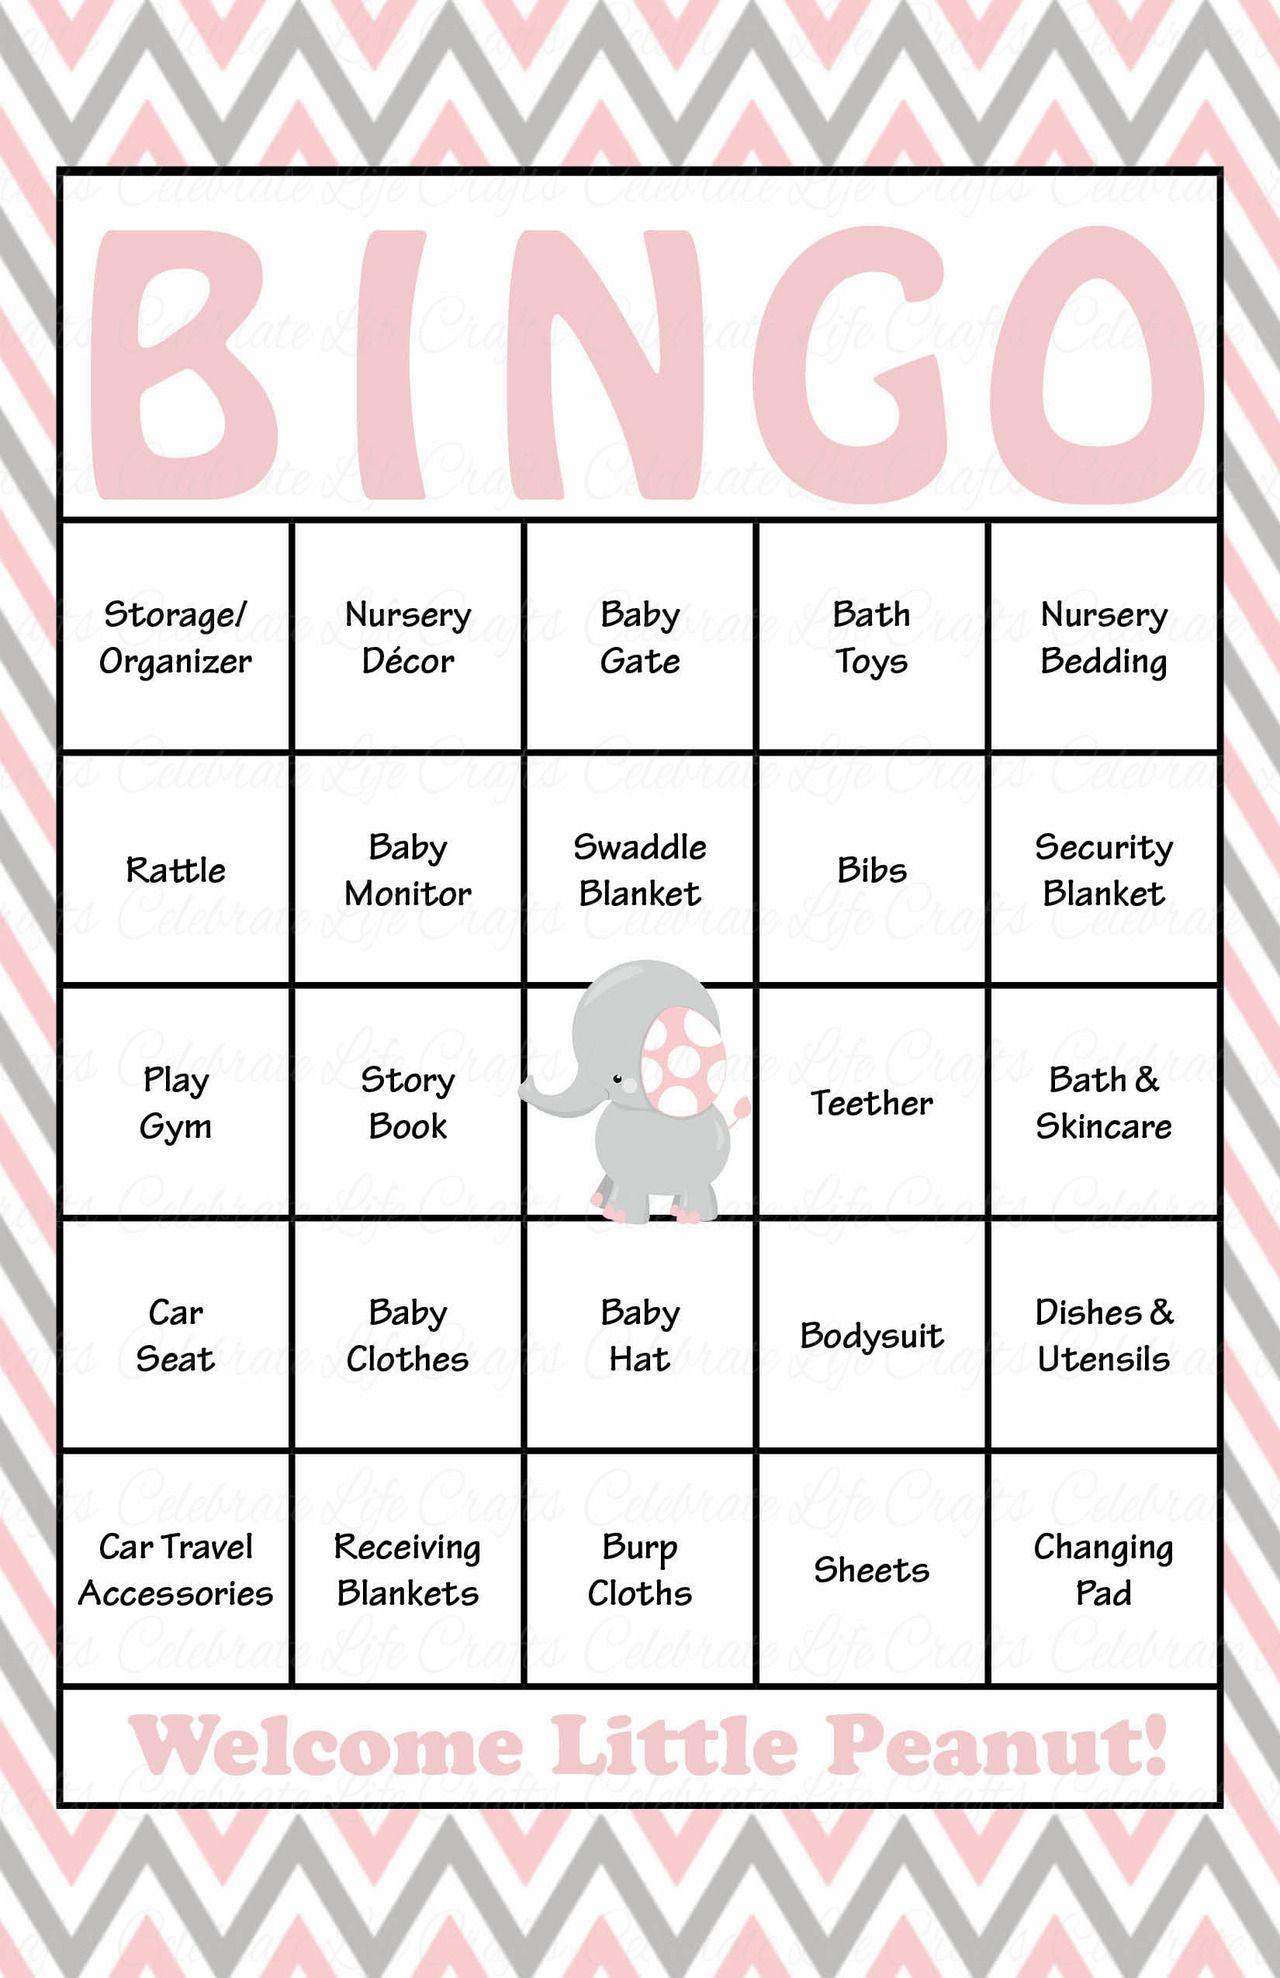 Elephant Baby Bingo Cards - Printable Download - Prefilled - Baby - 50 Free Printable Baby Bingo Cards